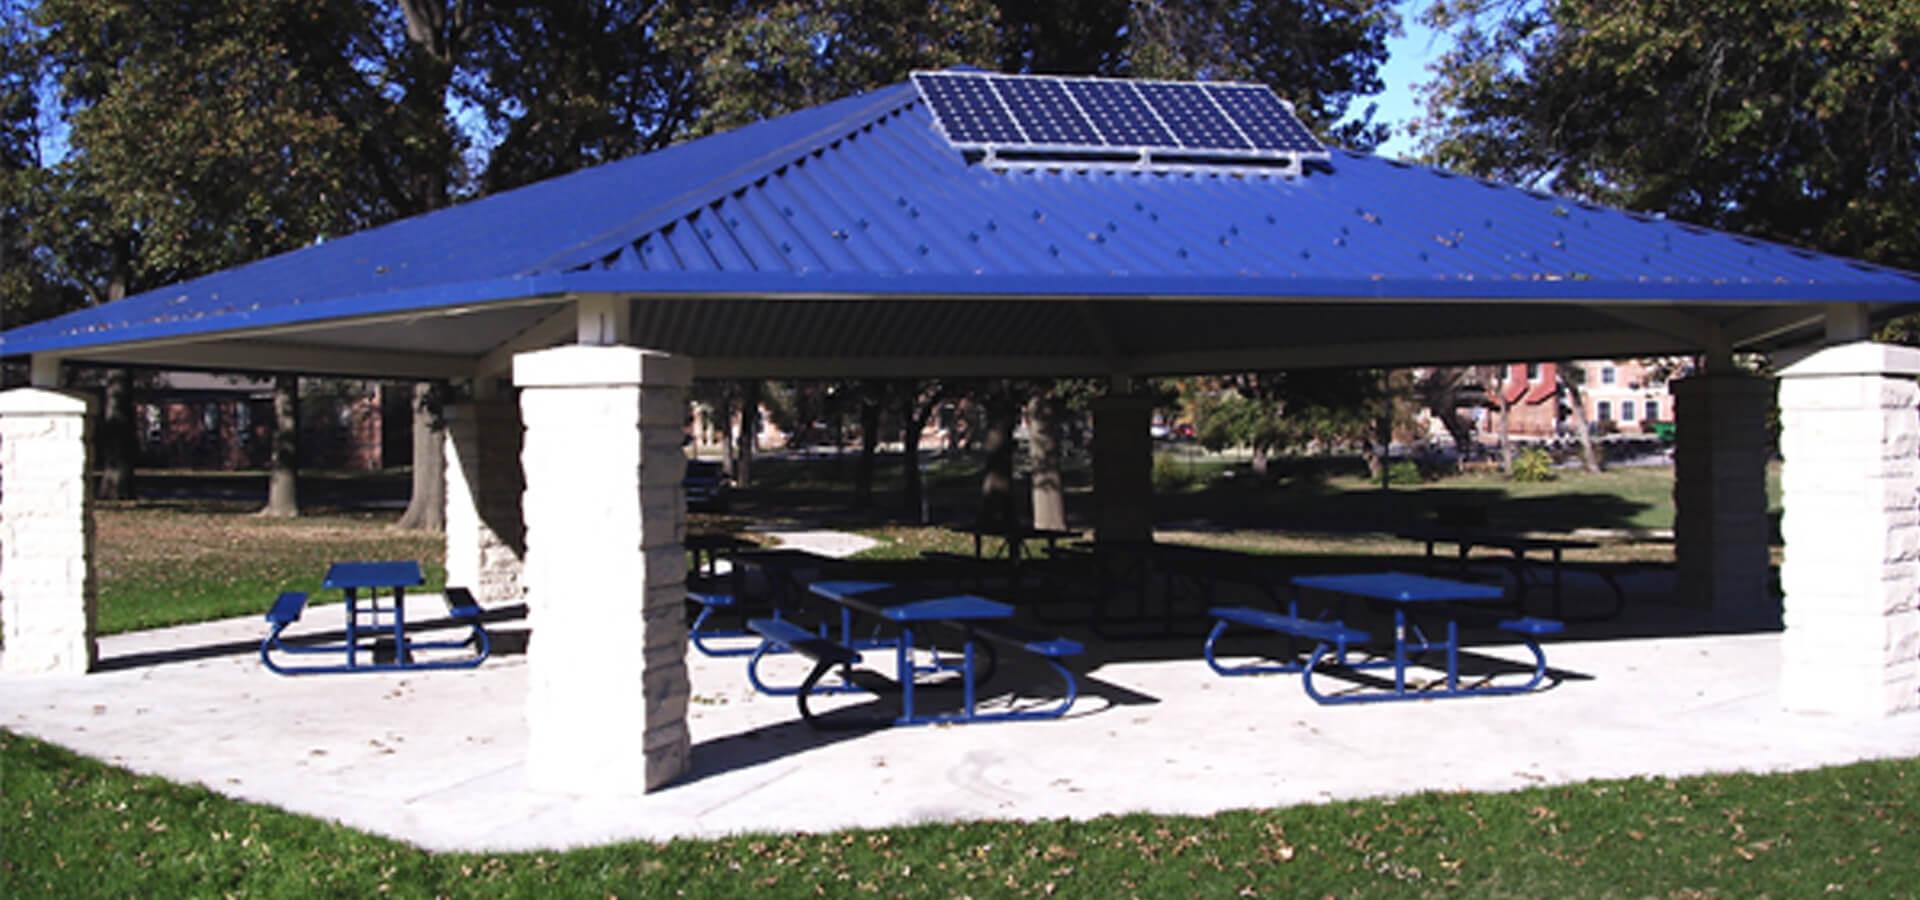 SolarEuroluxe Sunnyside Park.jpg